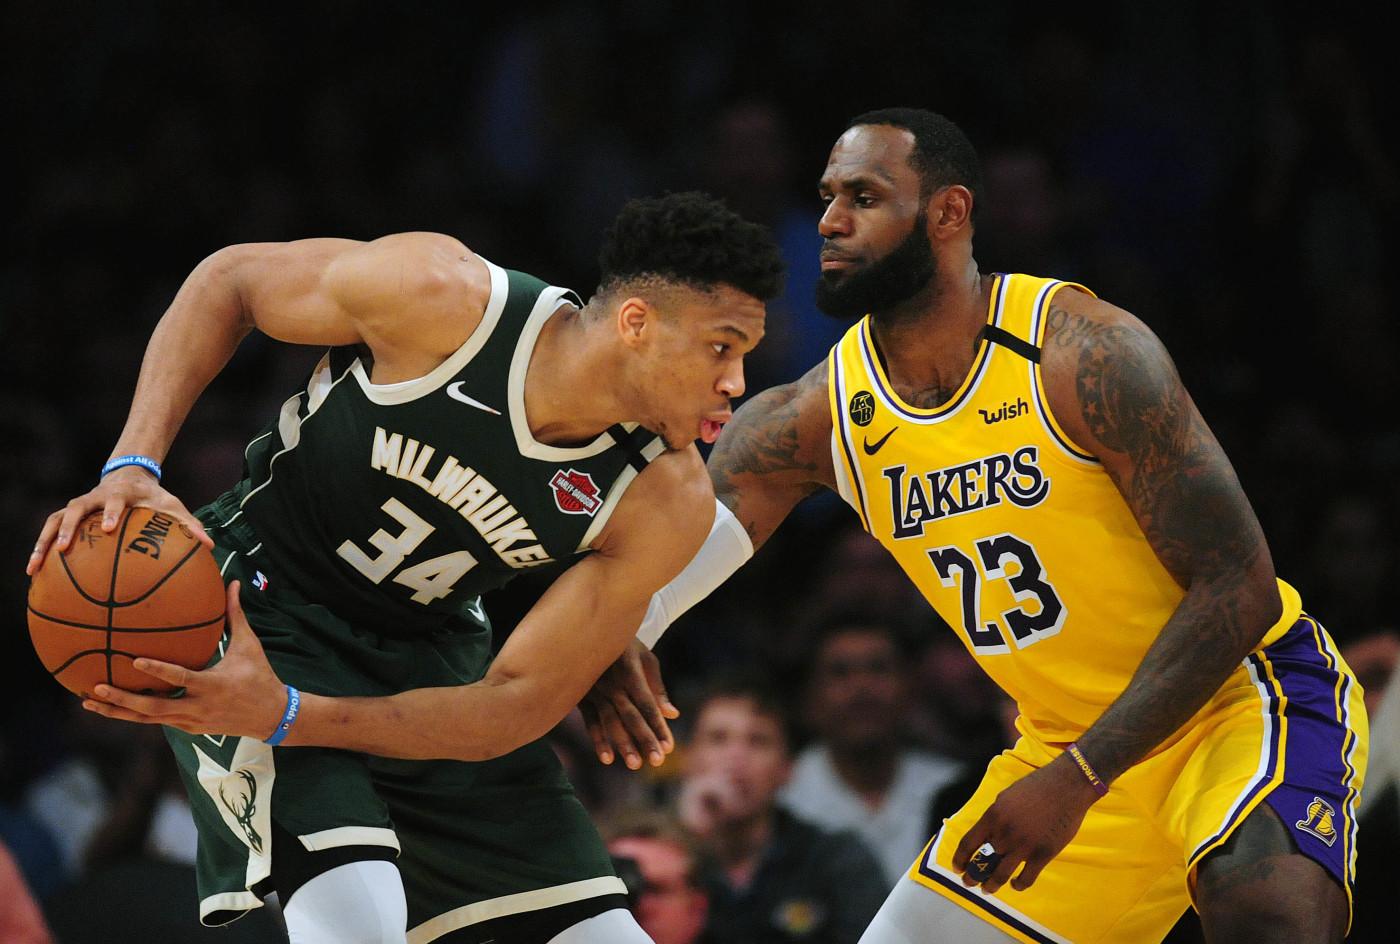 Giannis Antetokounmpo LeBron James Los Angeles Bucks Lakers 2020